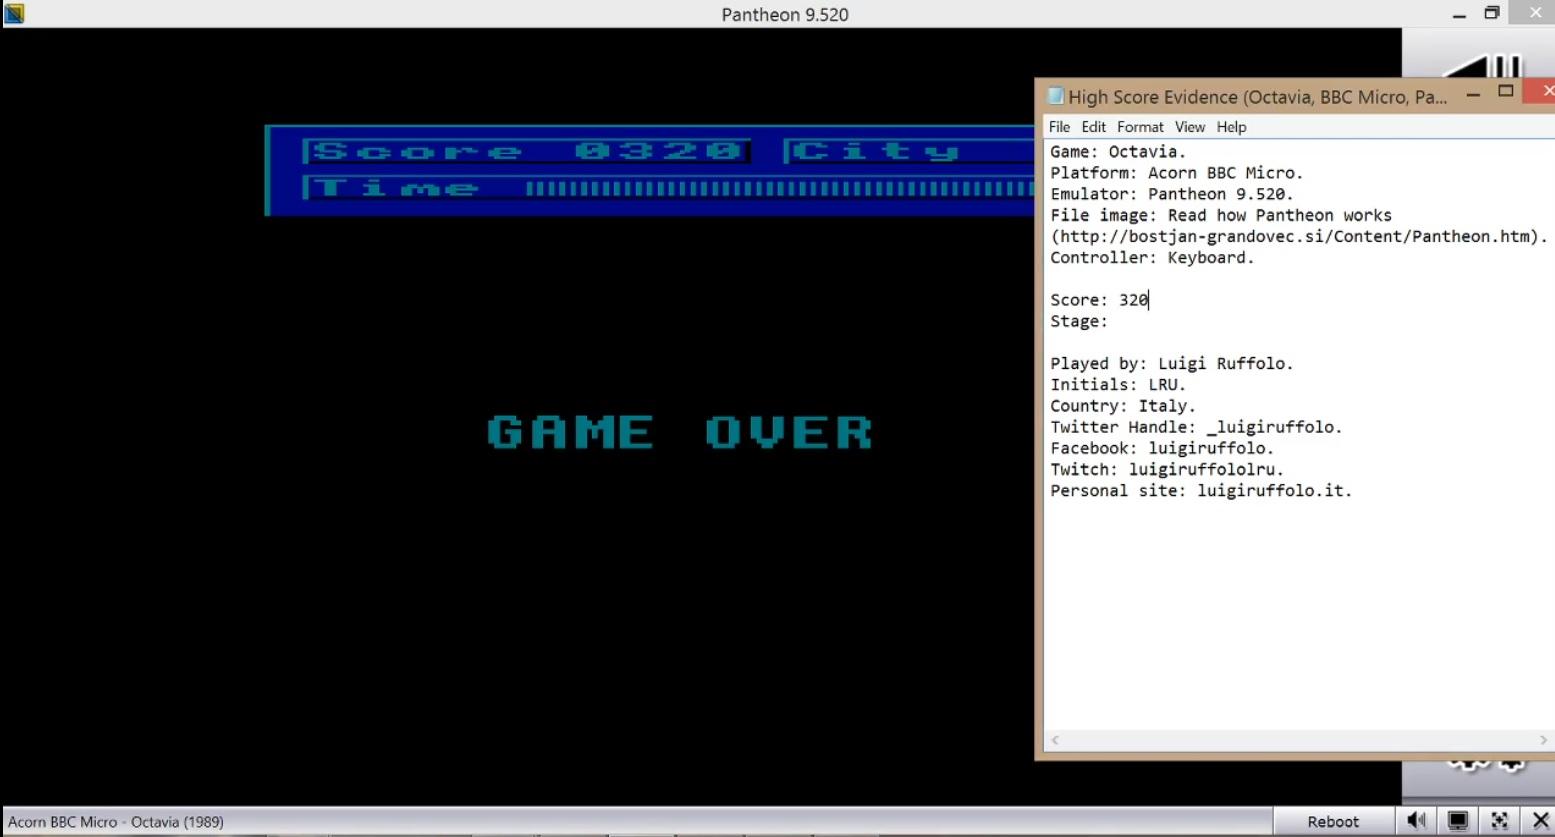 LuigiRuffolo: Octavia (BBC Micro Emulated) 320 points on 2020-08-14 02:41:25